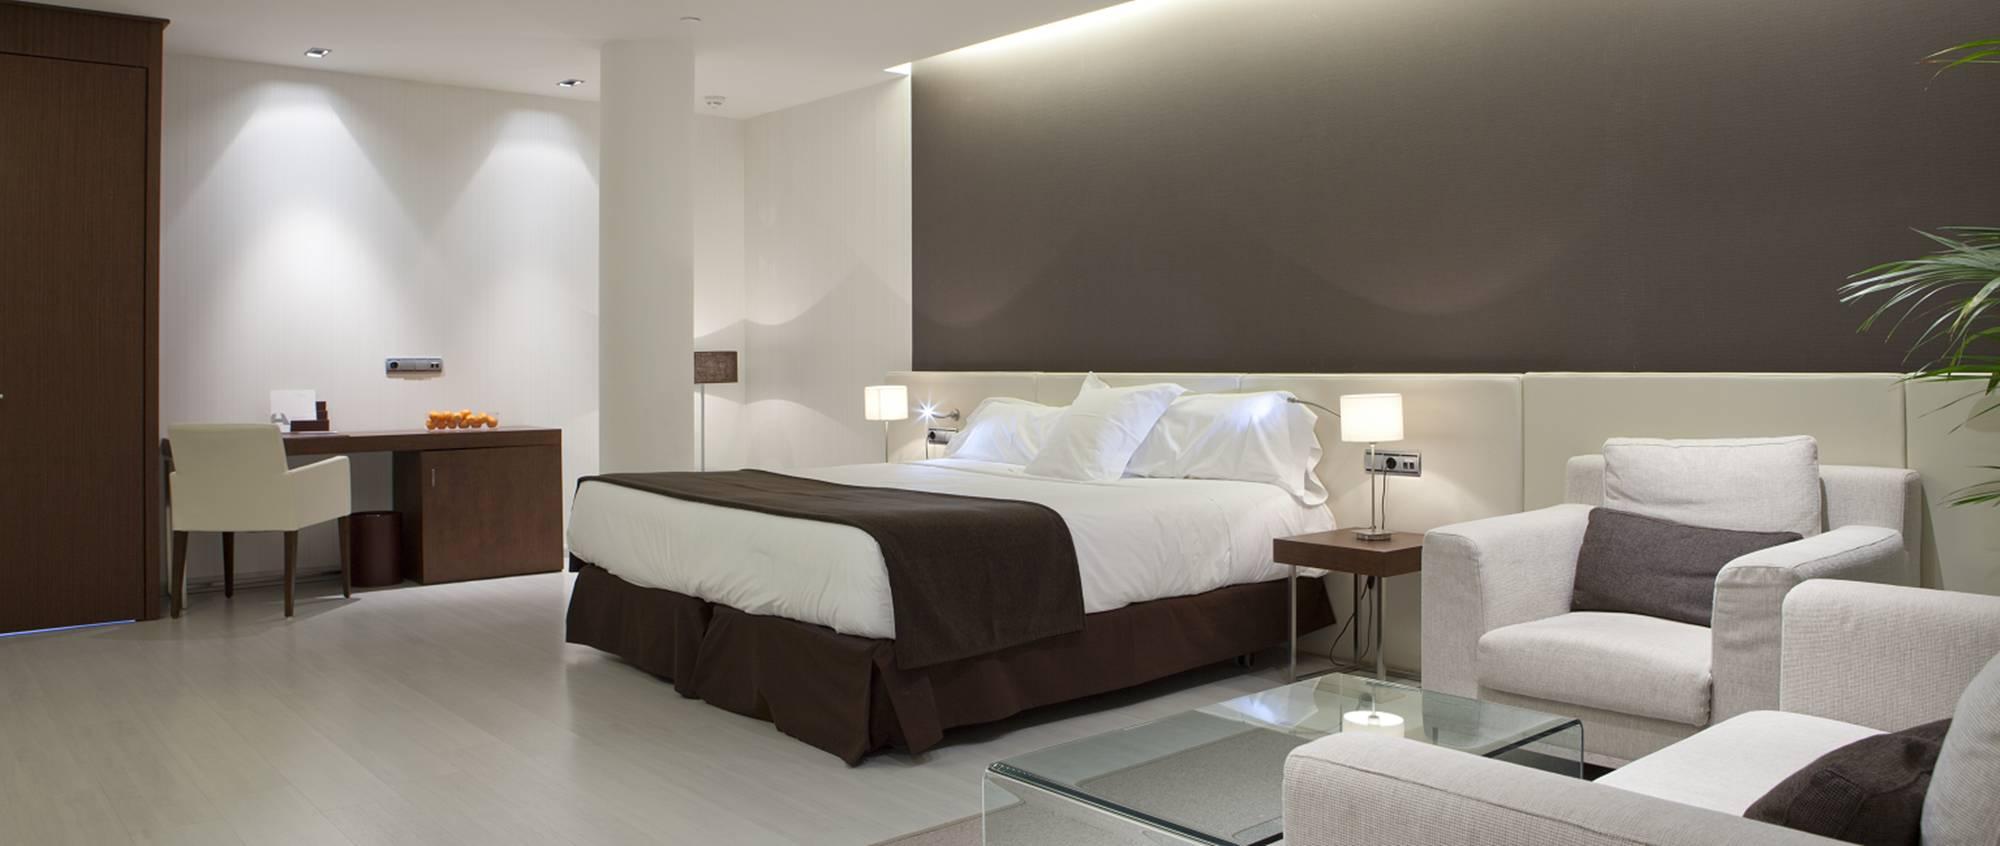 Fotos del hotel - HOTEL DIAGONAL PLAZA